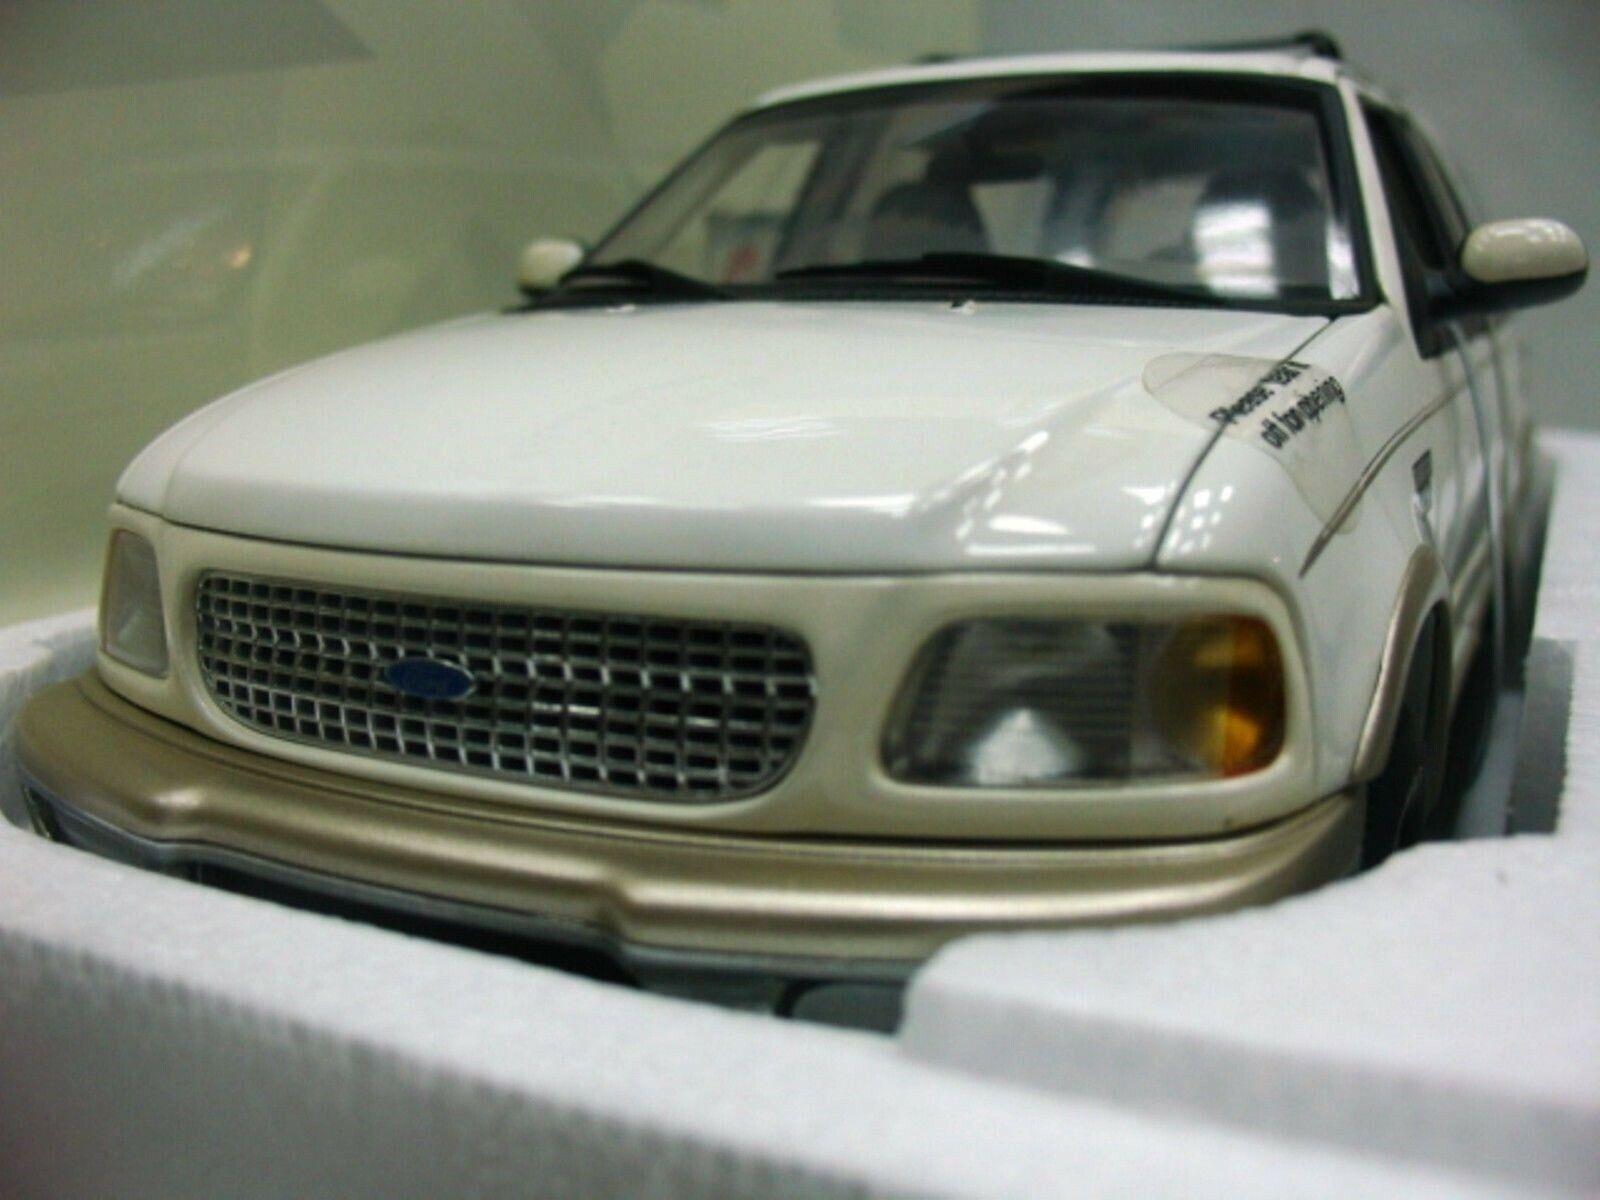 WOW estremamente raro SUV Ford Expedition 4x4 5.4 V8 EB 1998 Bianco 1 18 UT-AUTO ART